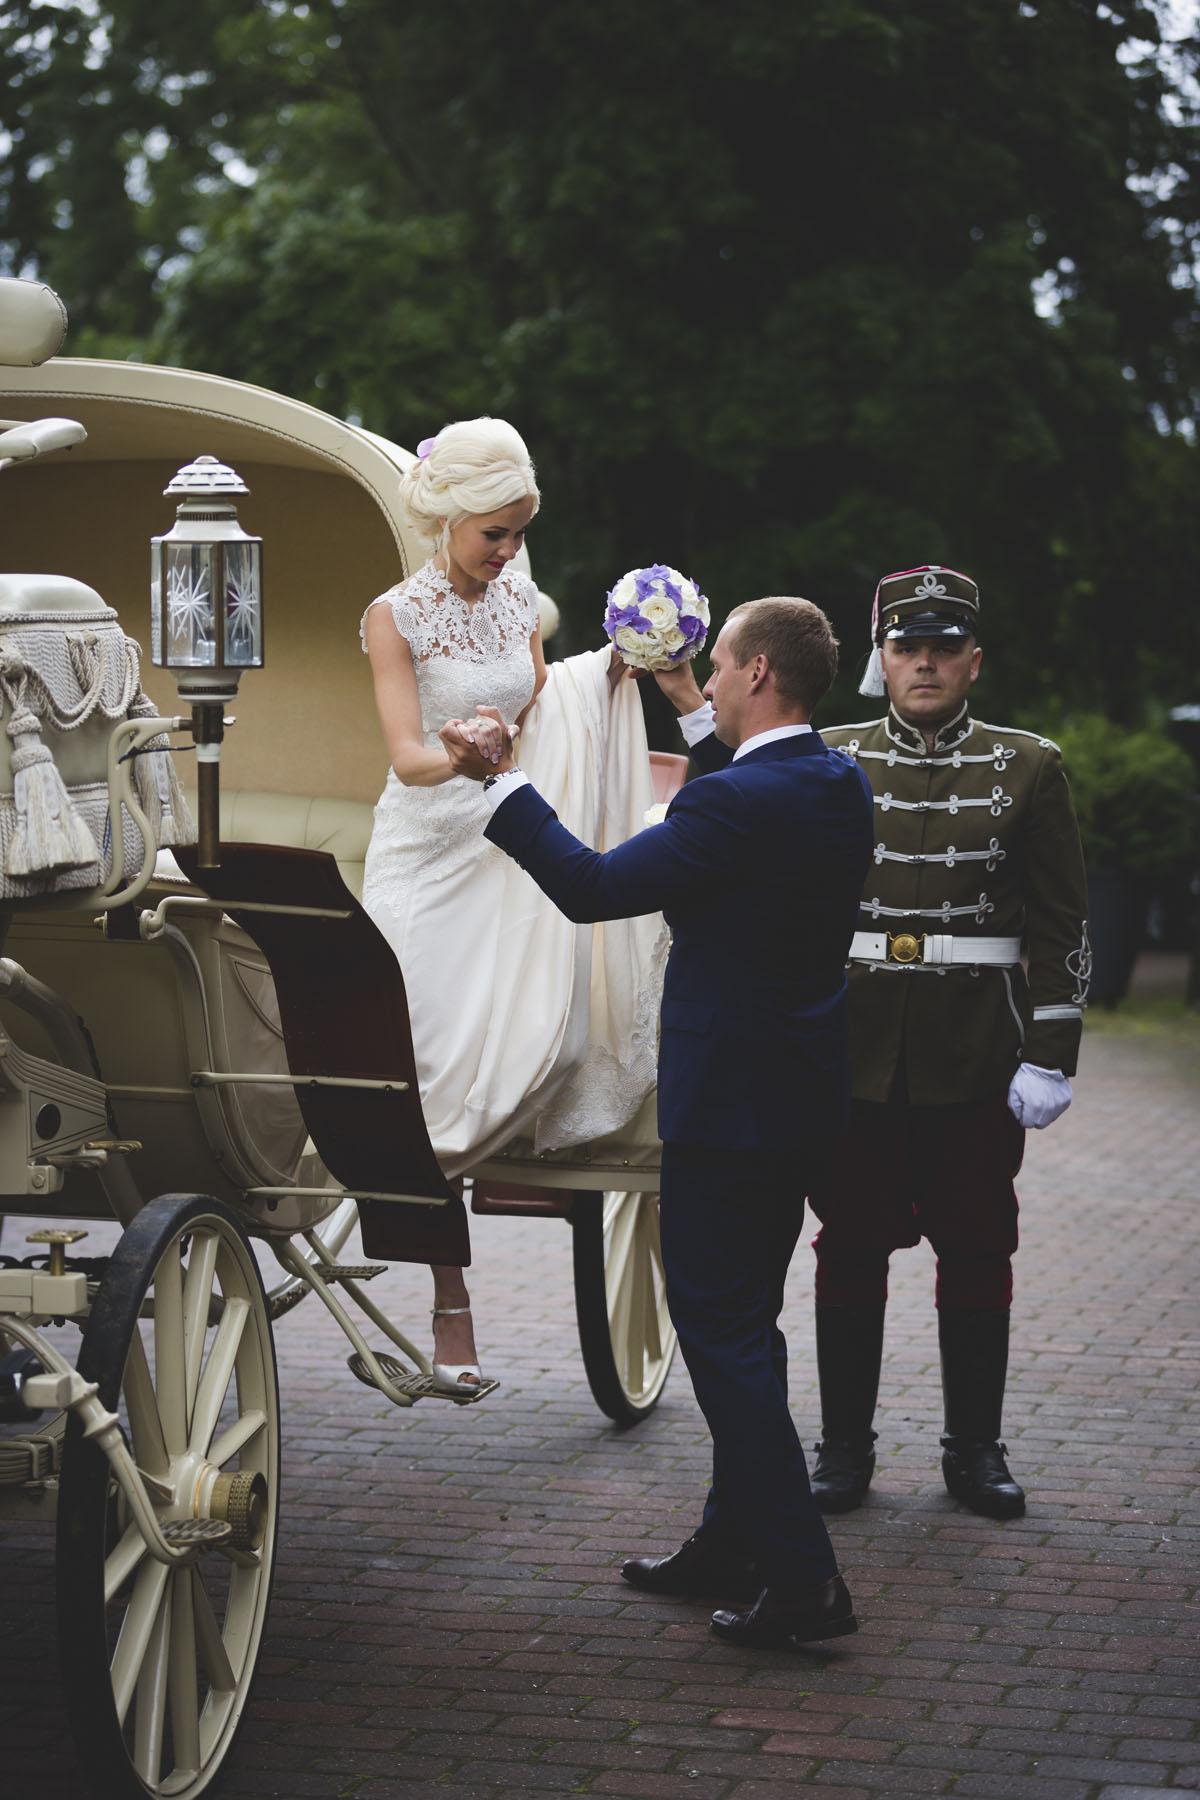 wedding-photos-080-estonian-wedding-photographer.jpg